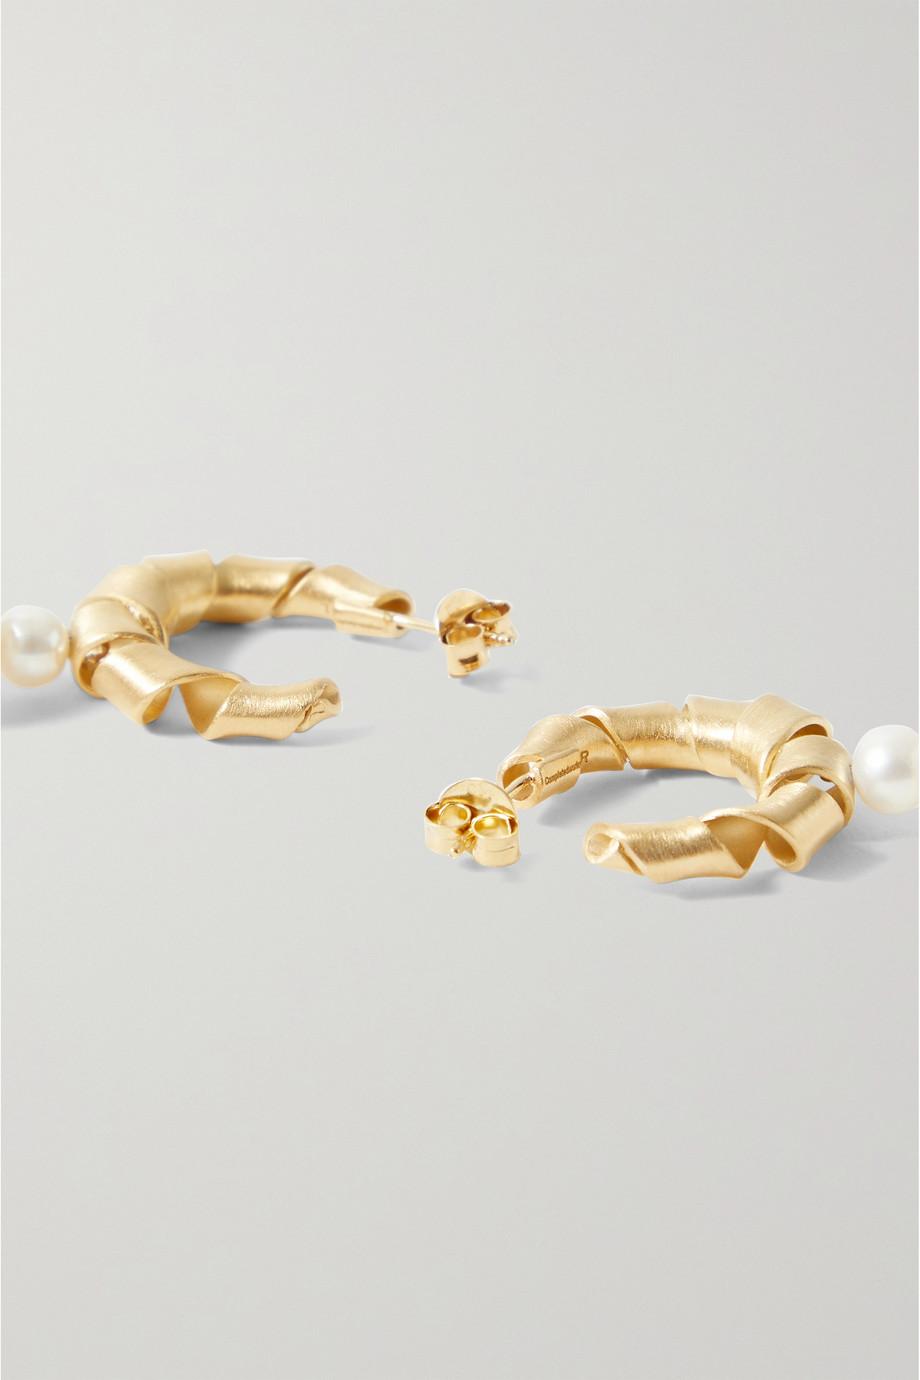 Completedworks Wibble, Wobble gold-plated pearl hoop earrings